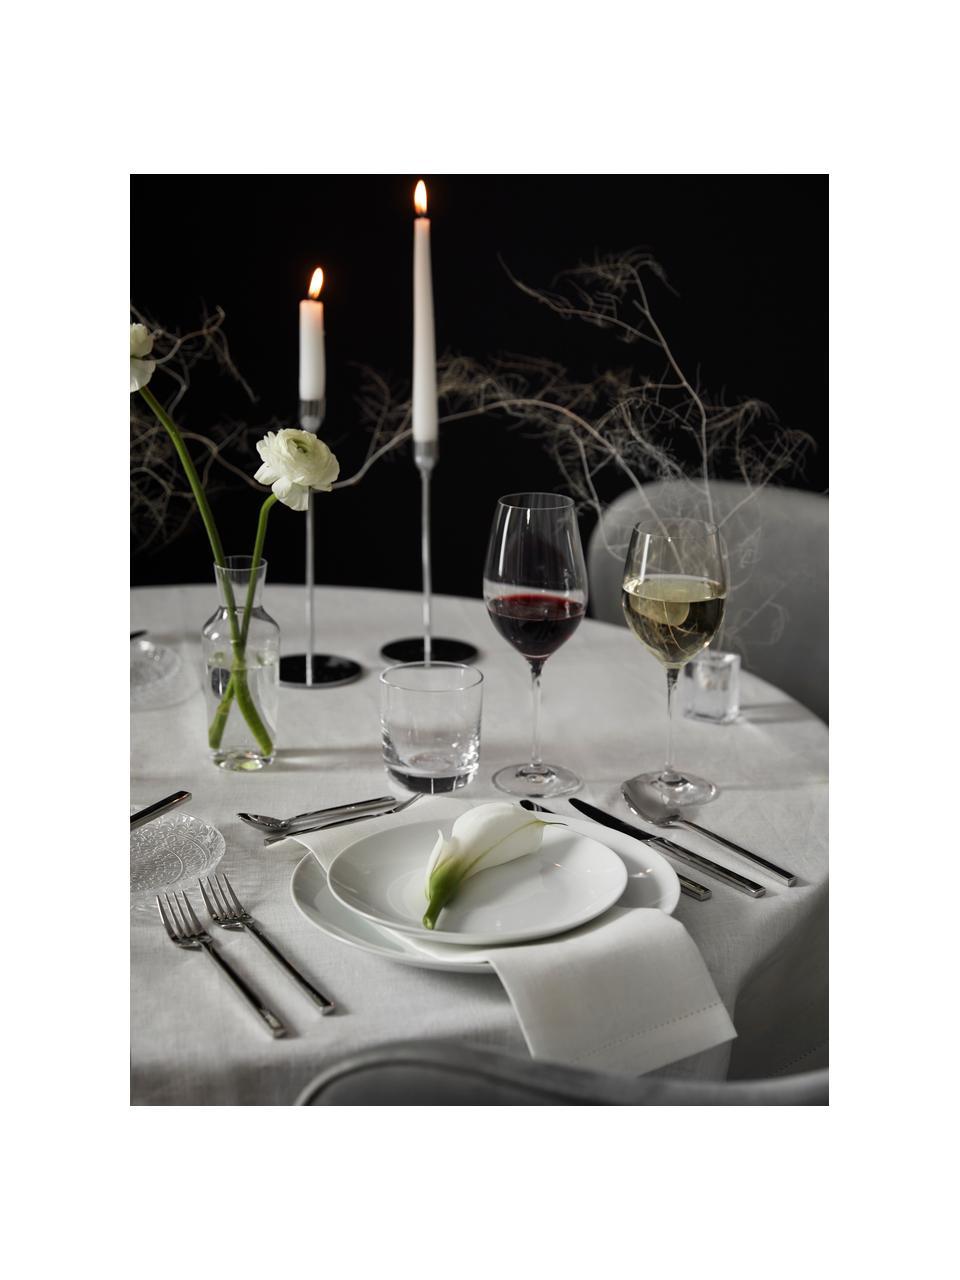 Talerz duży z porcelany Delight Modern, 2 szt., Porcelana, Biały, Ø 27 cm